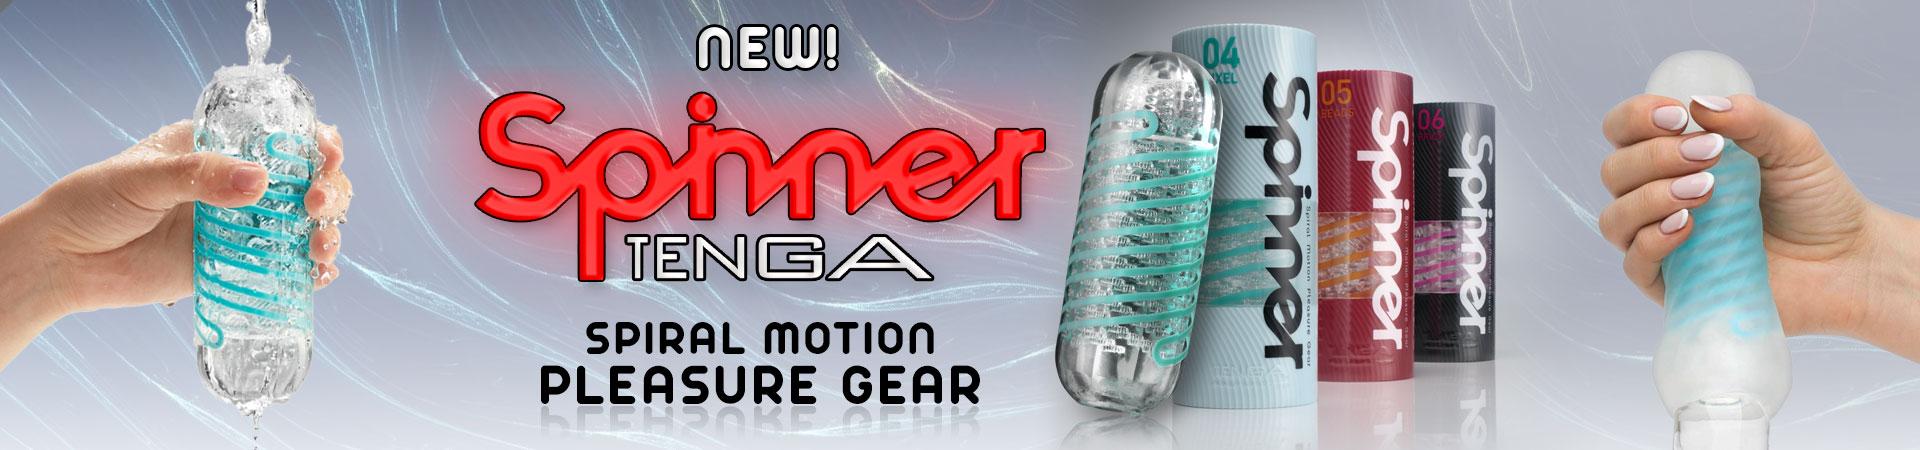 New Spinner By Tenga